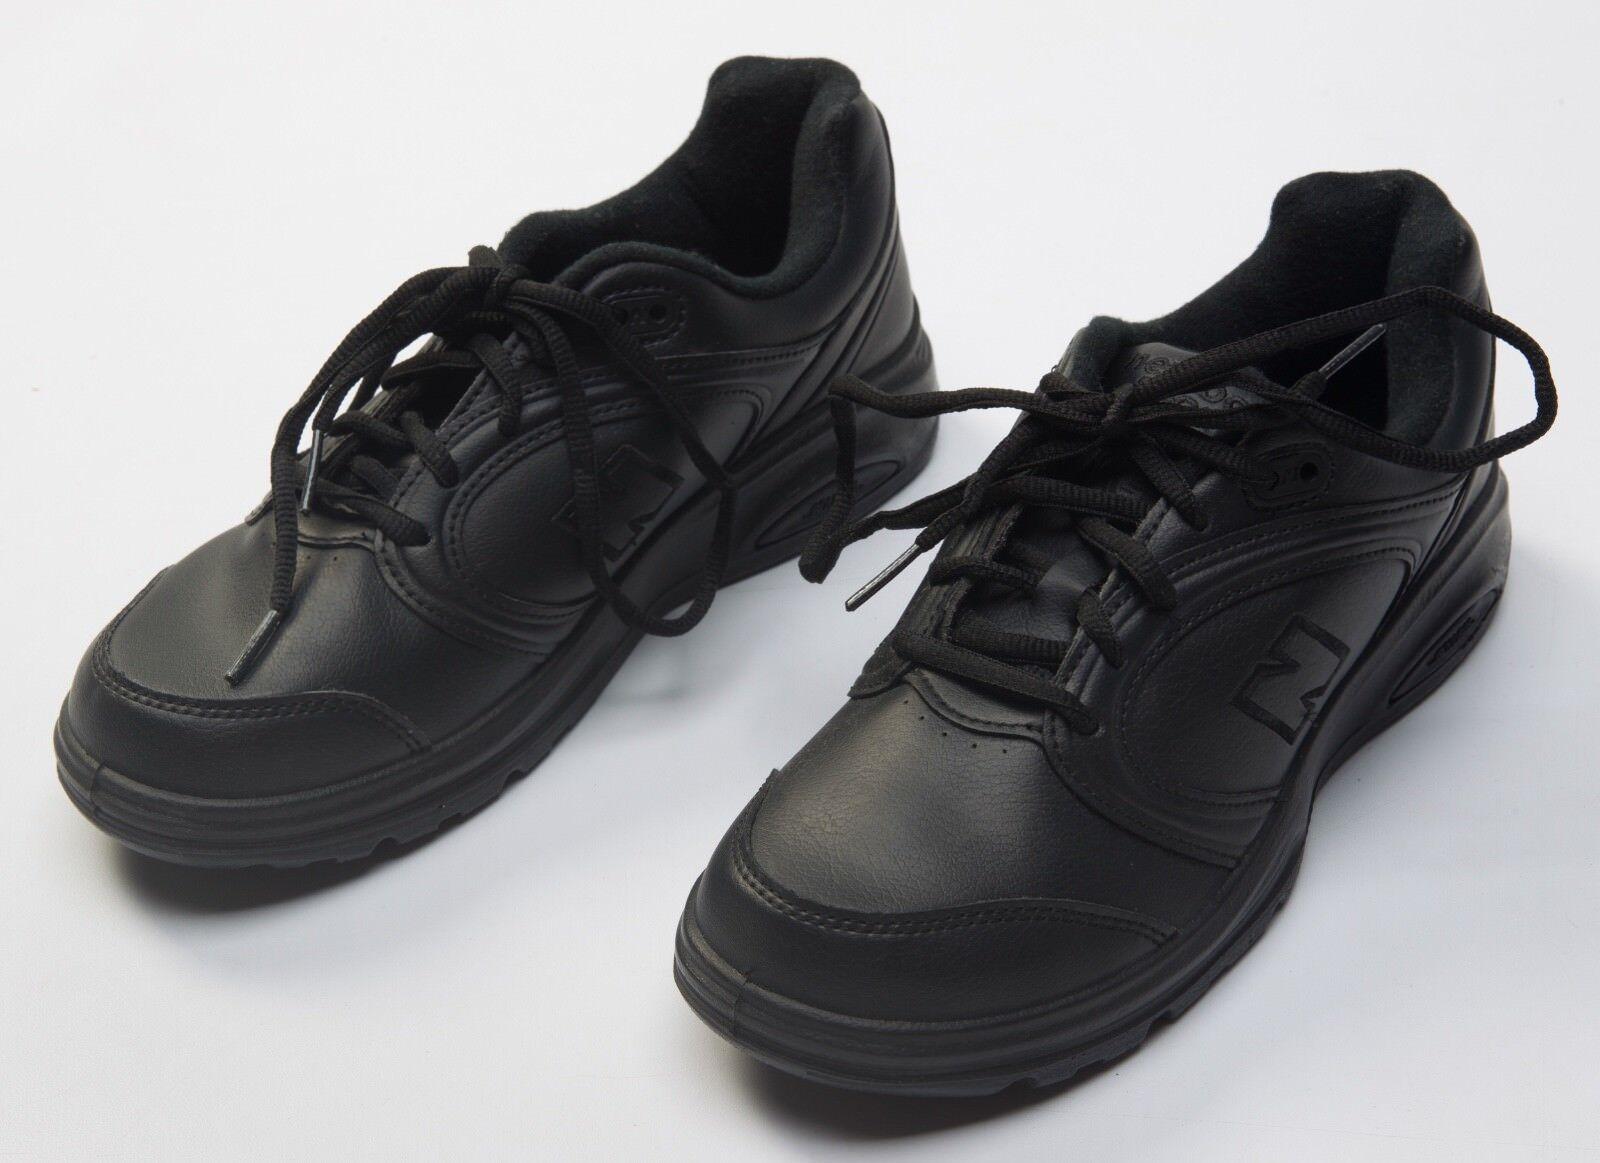 Women's New Balance NB WW812 Walking Athletic Shoes Size Sz US 7 US7 Black NWOB